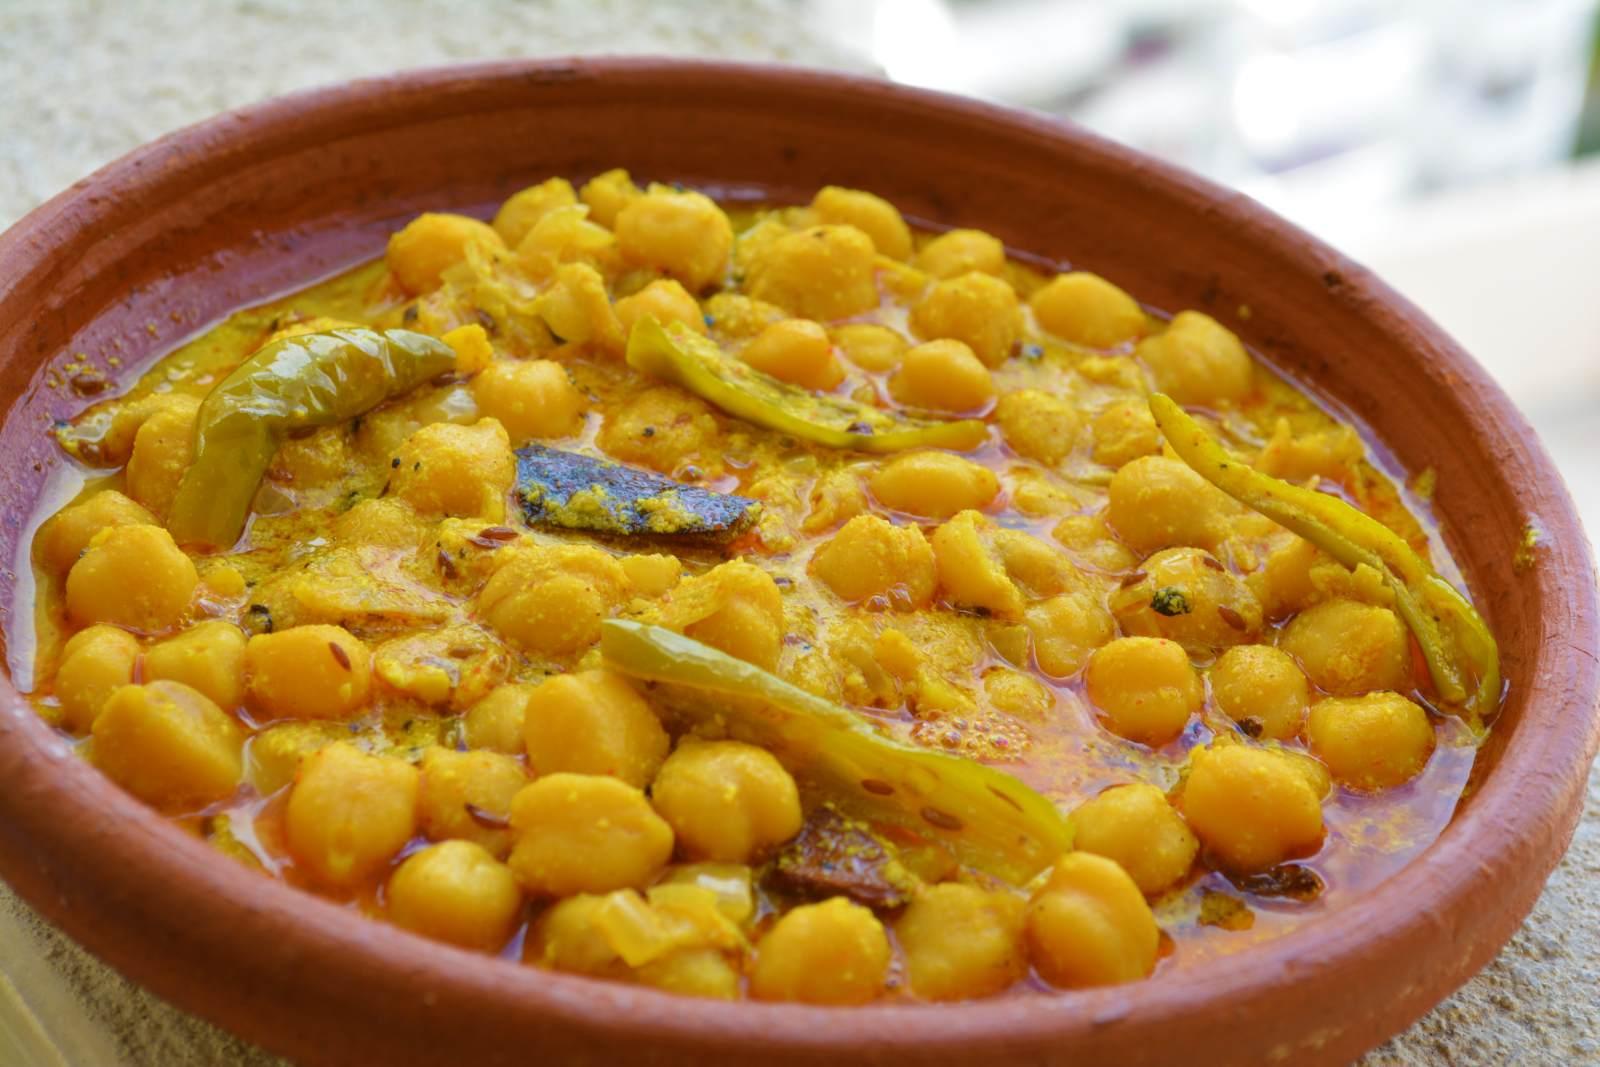 Himachali Chana Madra Recipe (Chickpeas In Yogurt Based Gravy) by Archana's  Kitchen